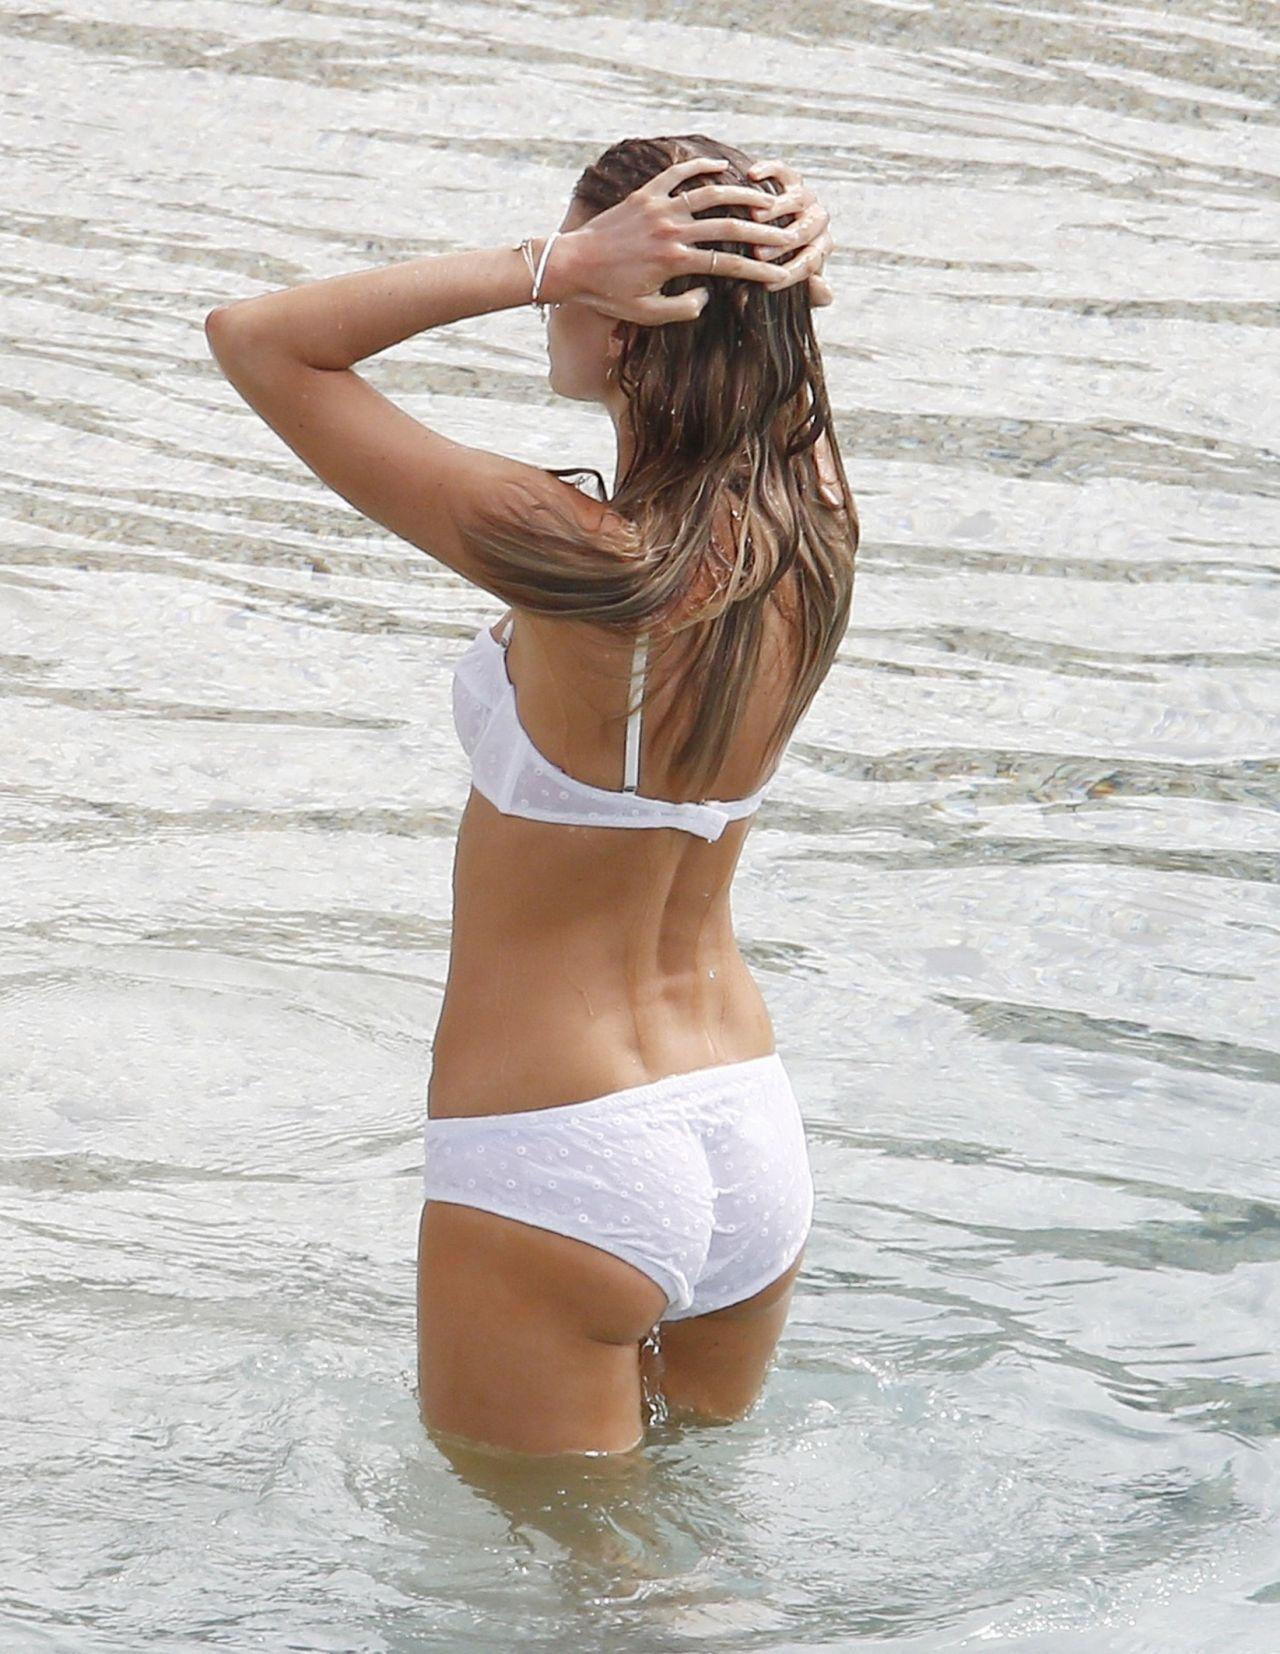 Maryna Linchuk Photoshoot For Vogue Shell Beach St